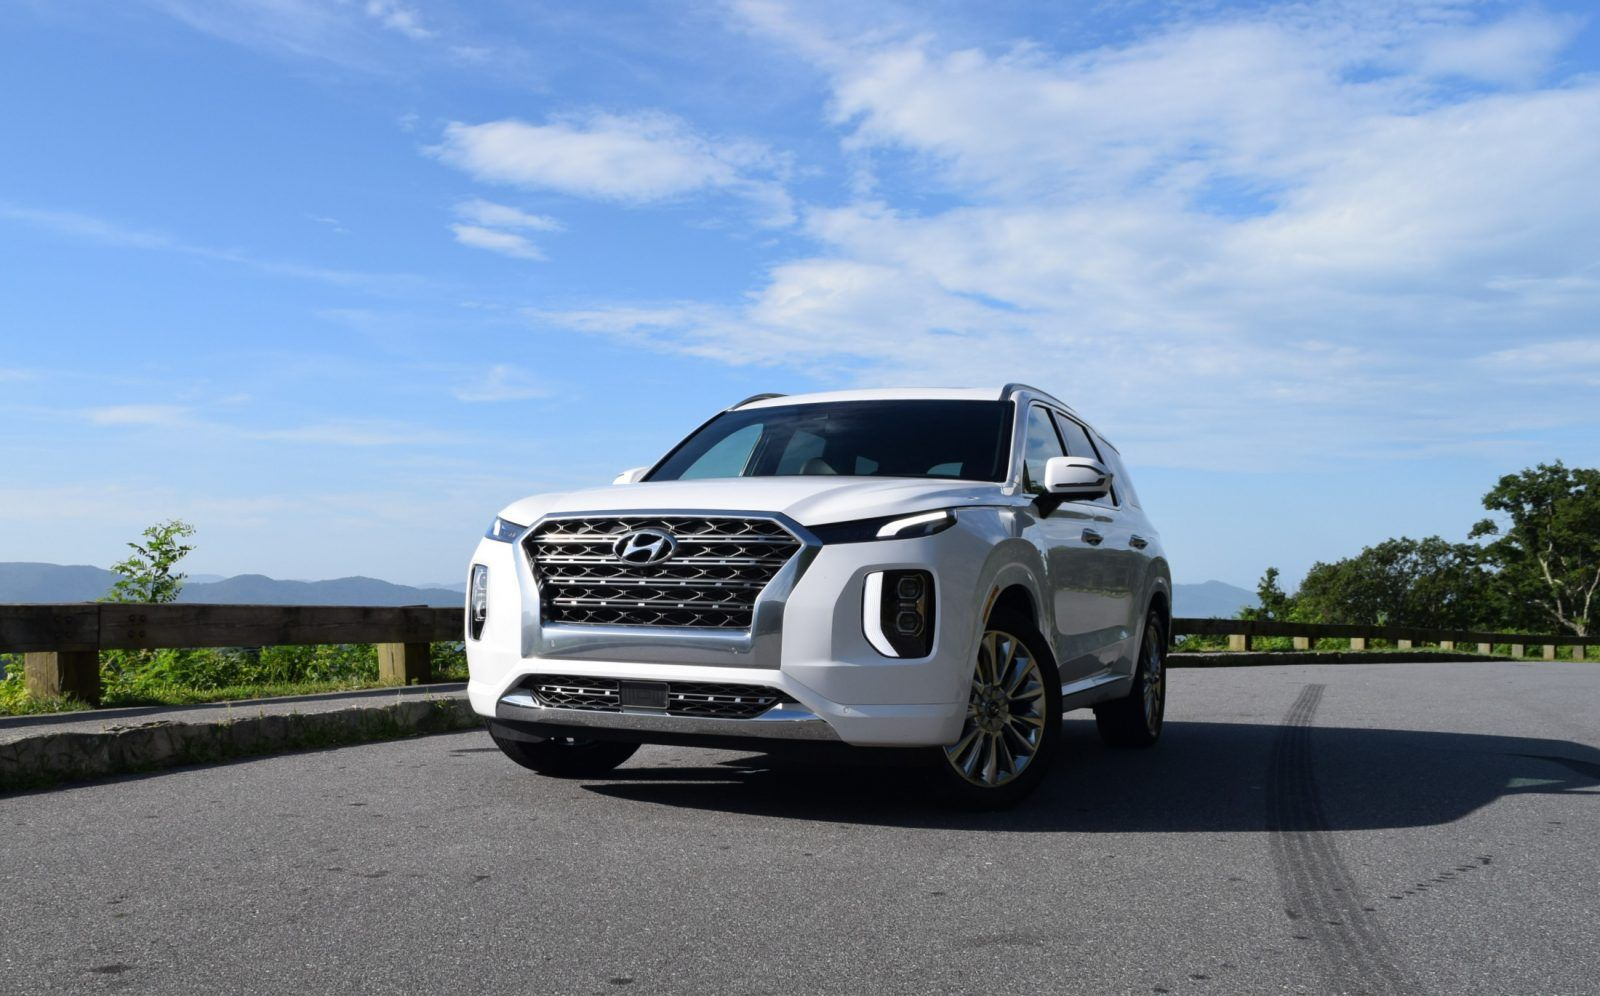 2020 Hyundai Palisade Asheville Nc 3 Hyundai Automotive News Latest Cars